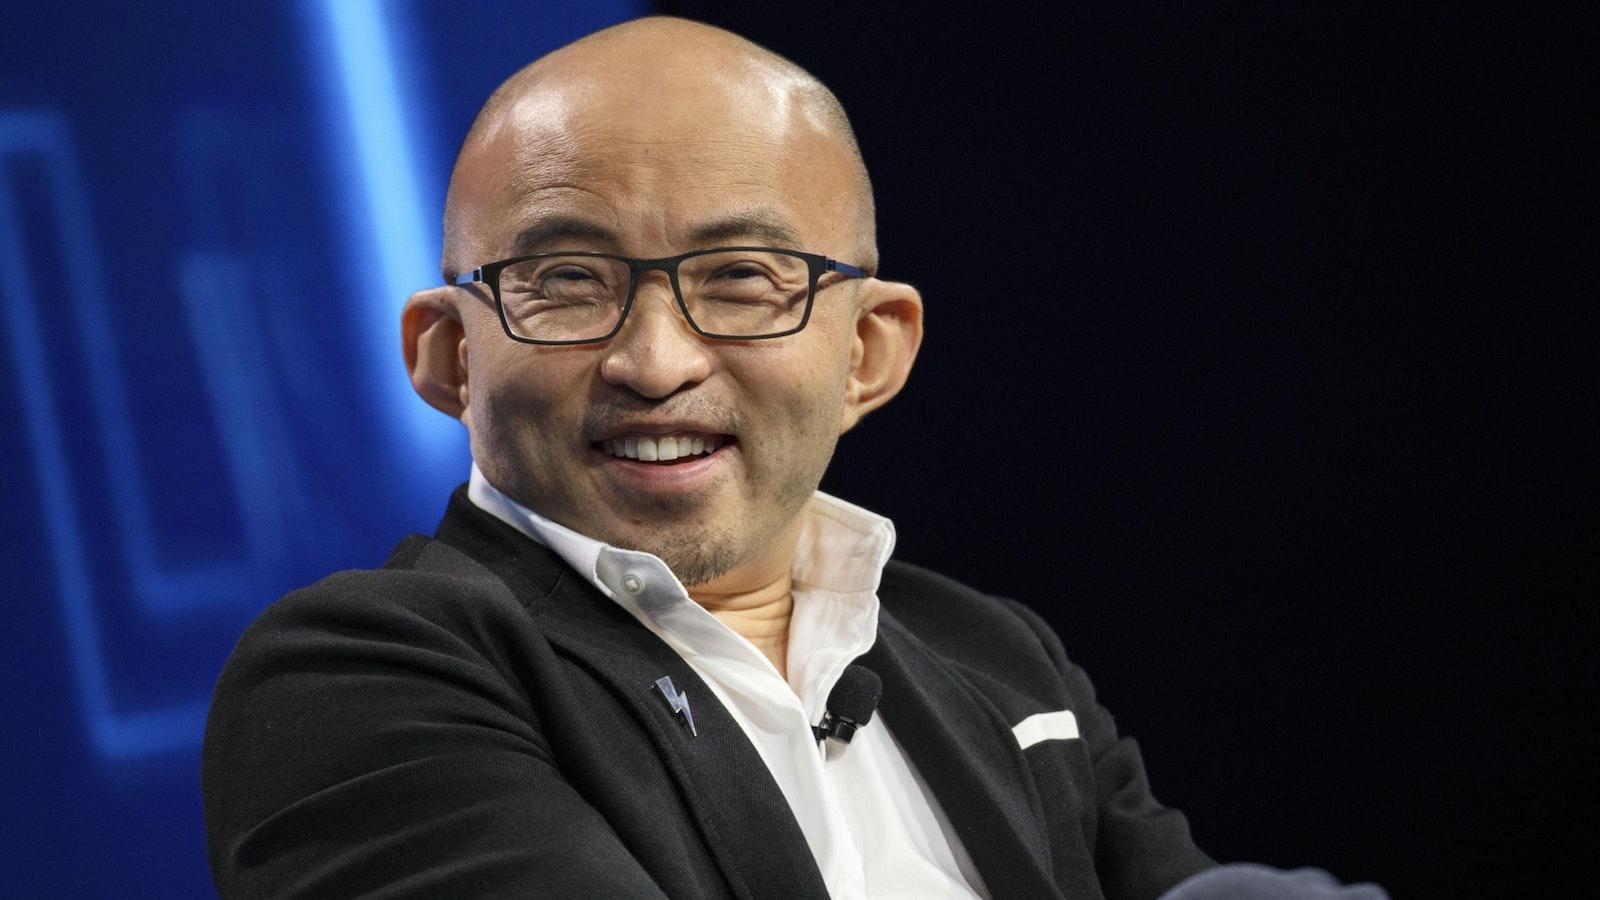 China Renaissance CEO Fan Bao. Photo by Bloomberg.